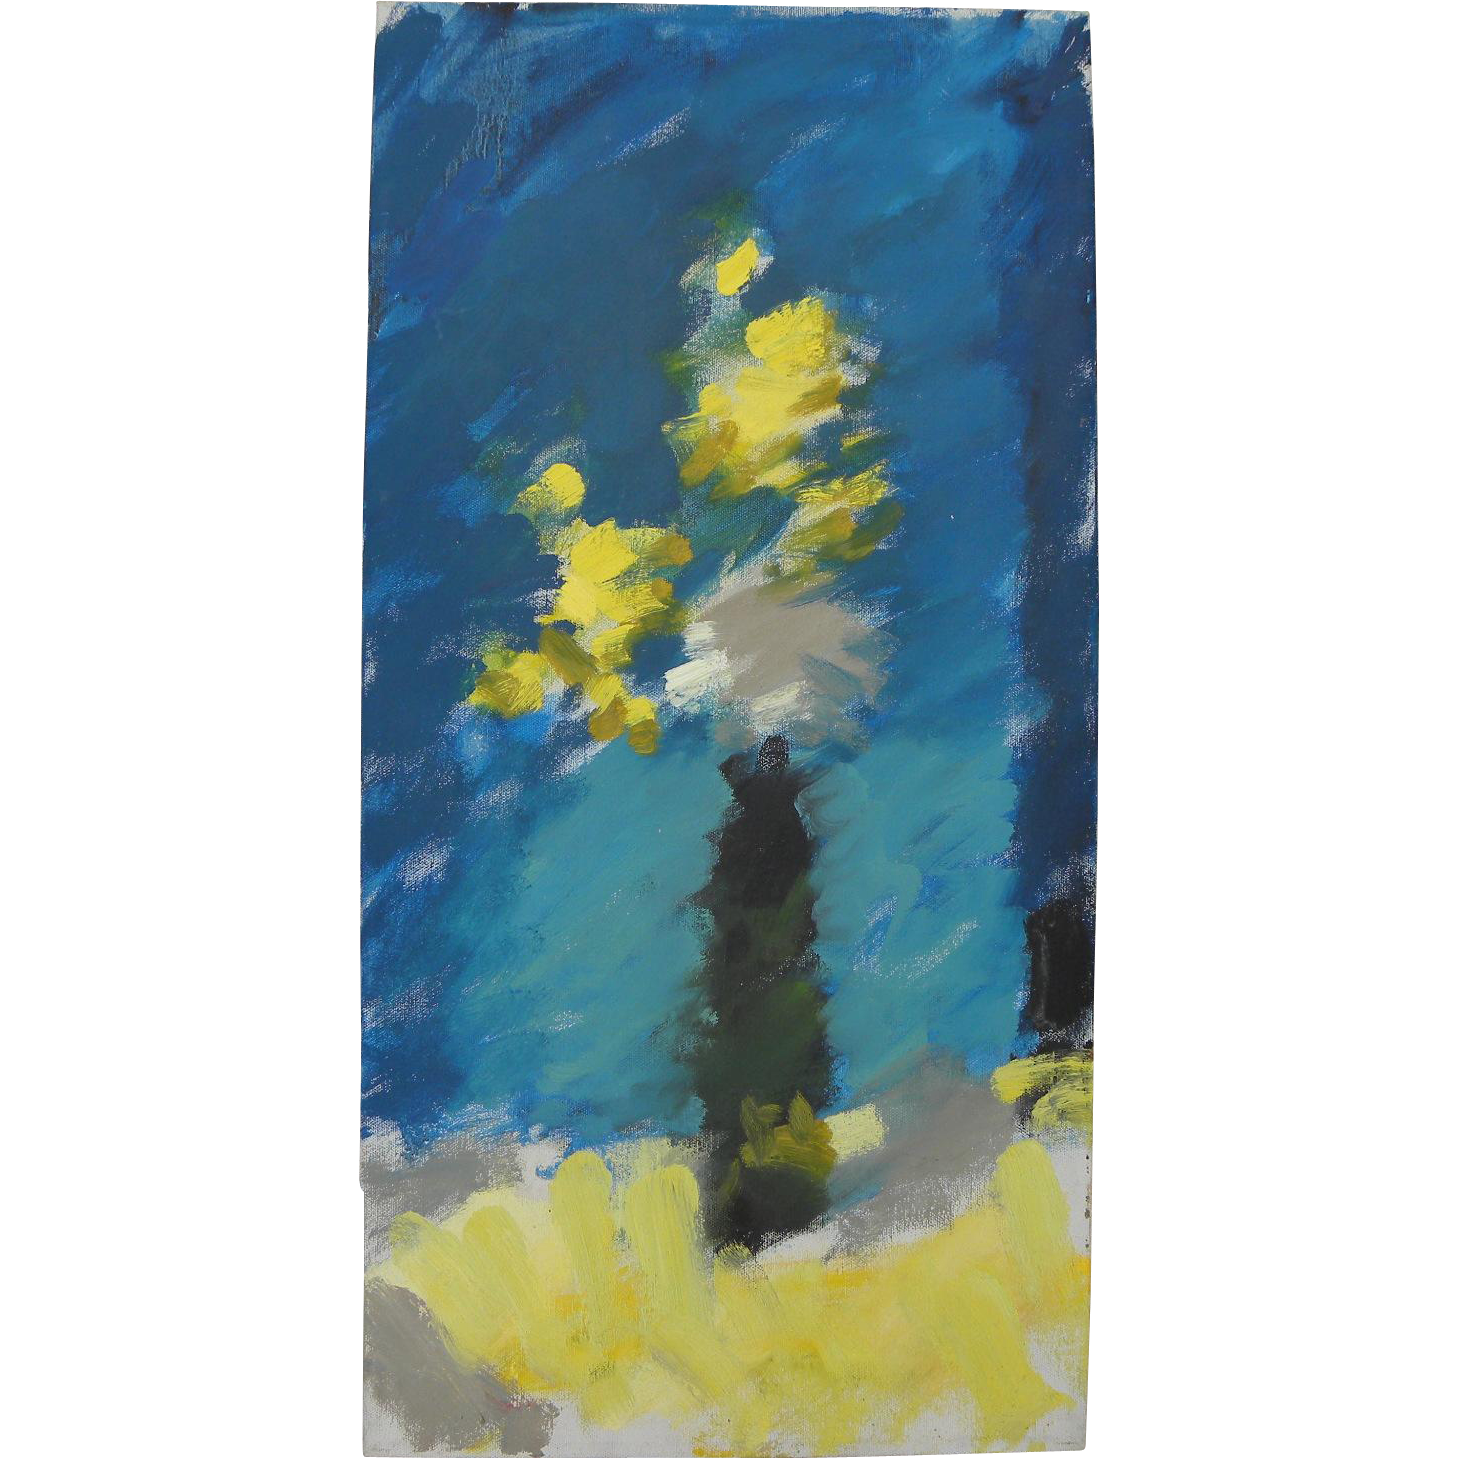 HAYWARD VEAL (1913-1968) Australian impressionist art still life painting